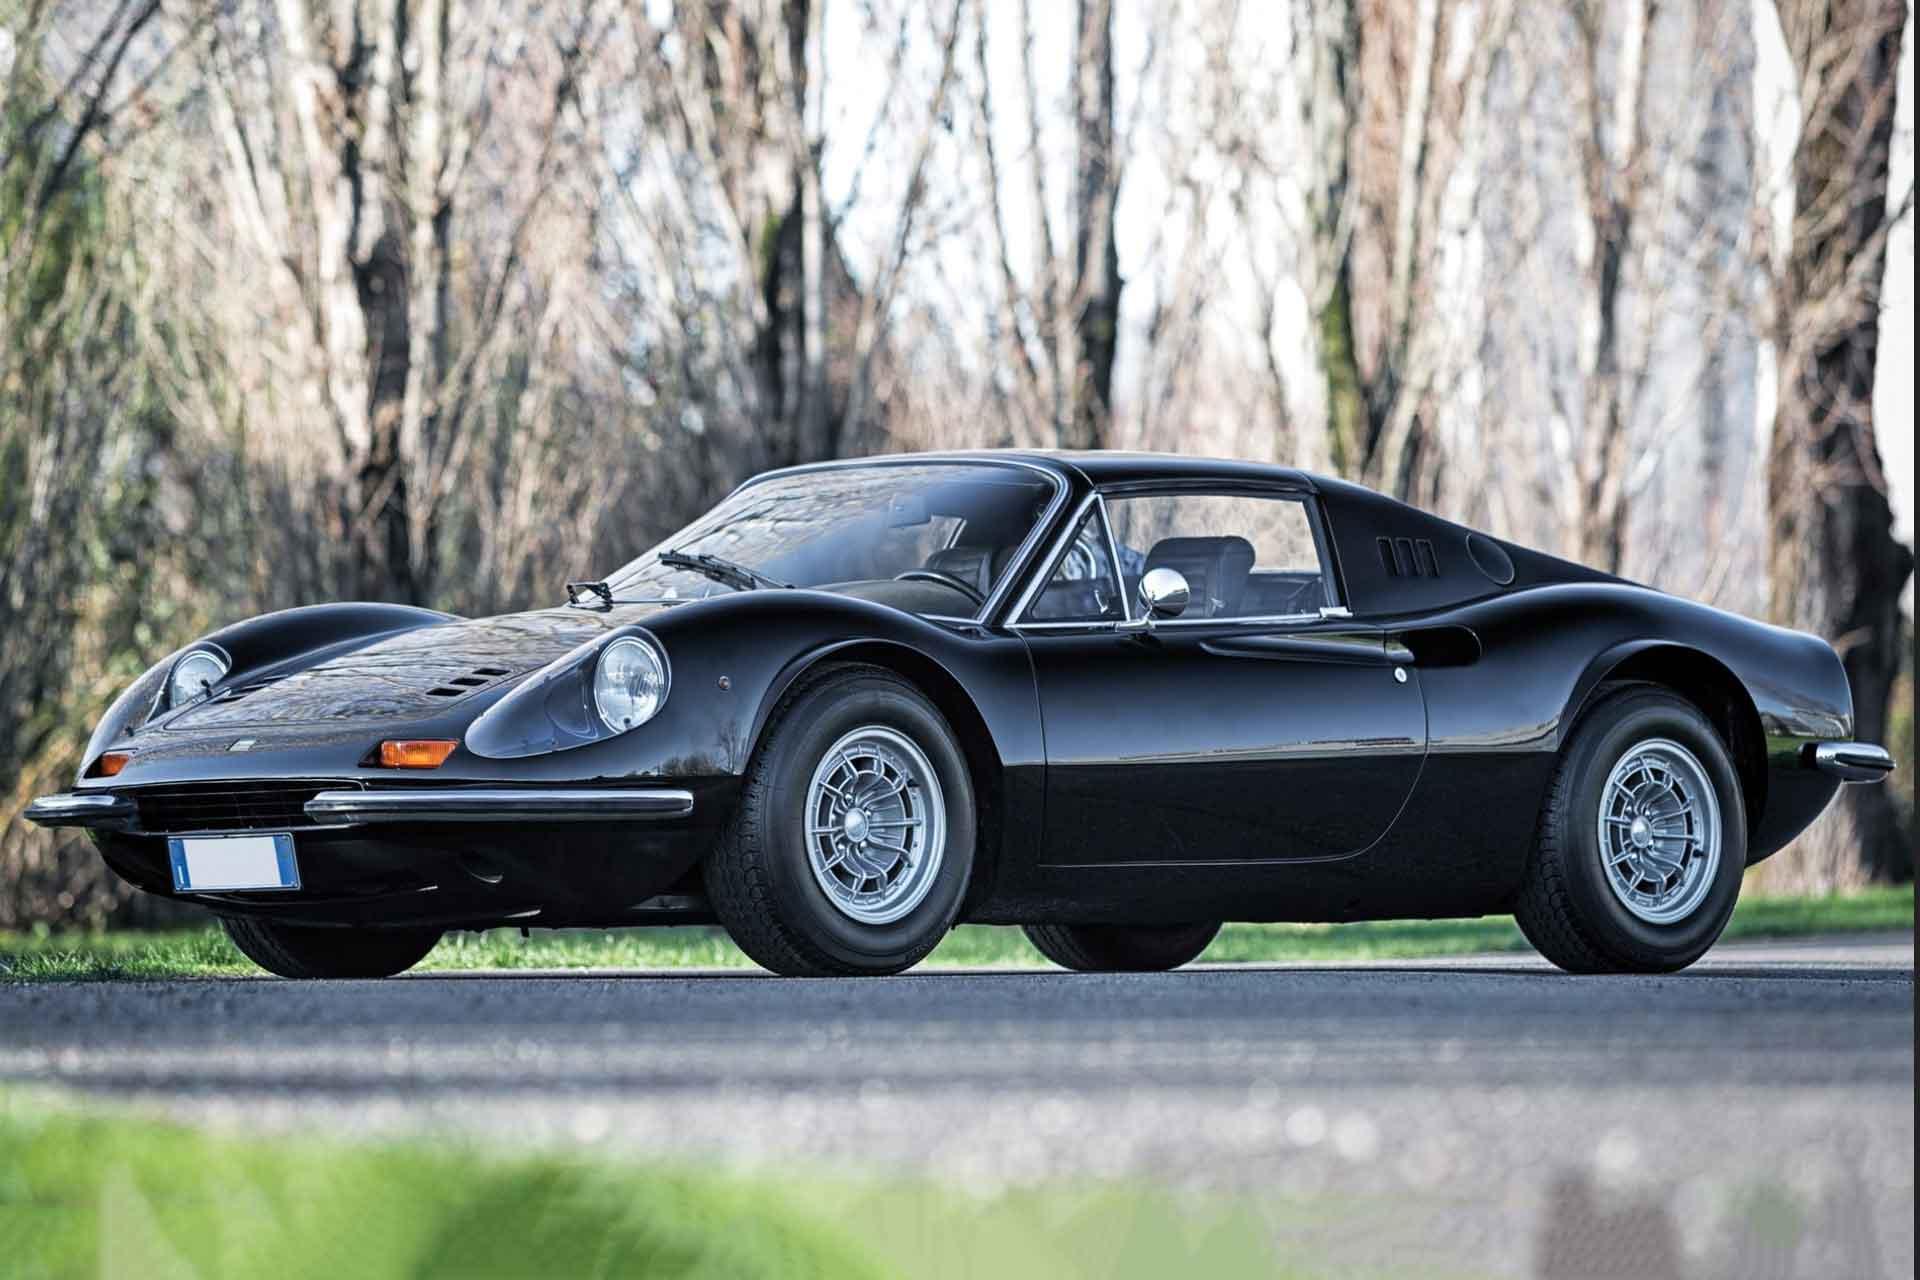 1973 Ferrari Dino 246 GTS Convertible